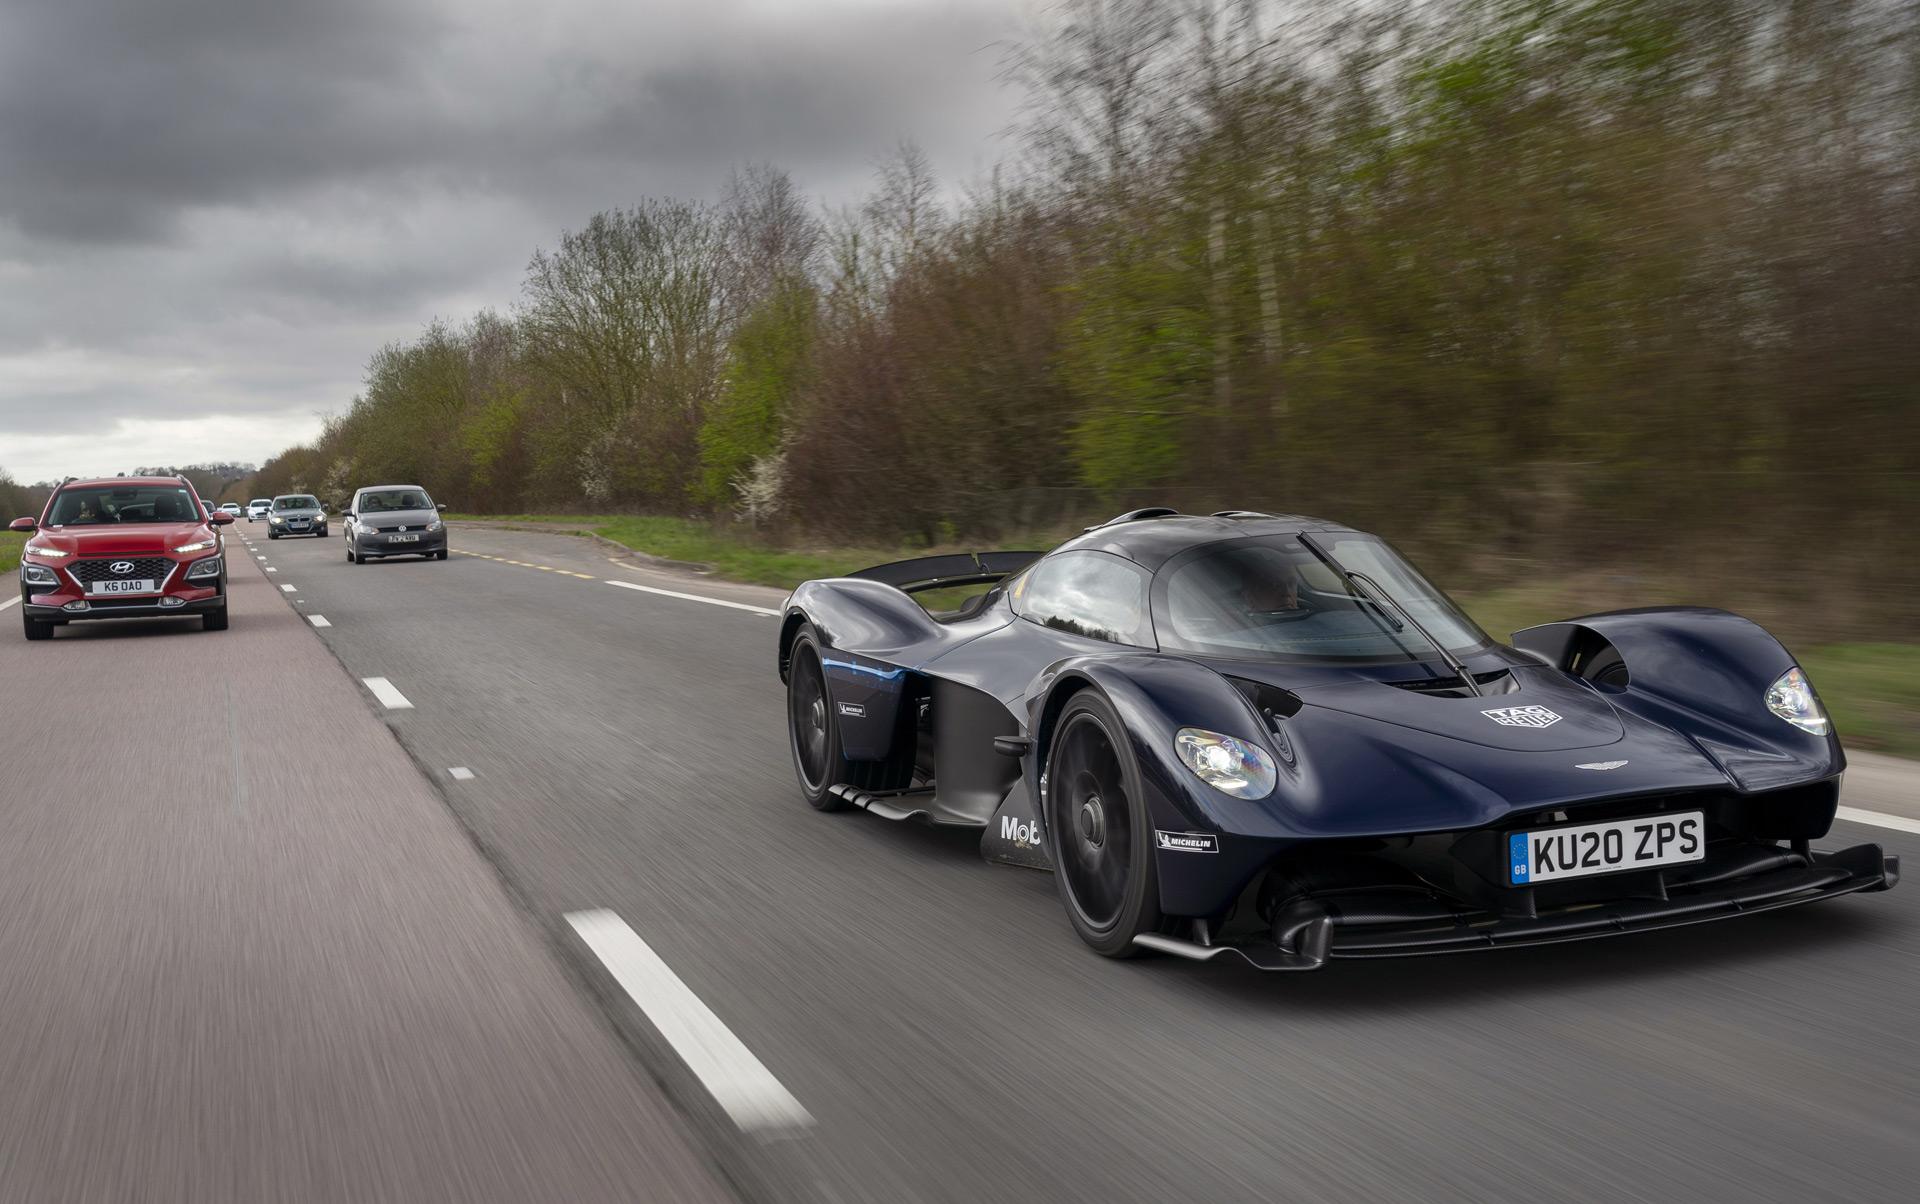 Aston Martin Valkyrie Finally Hits The Road